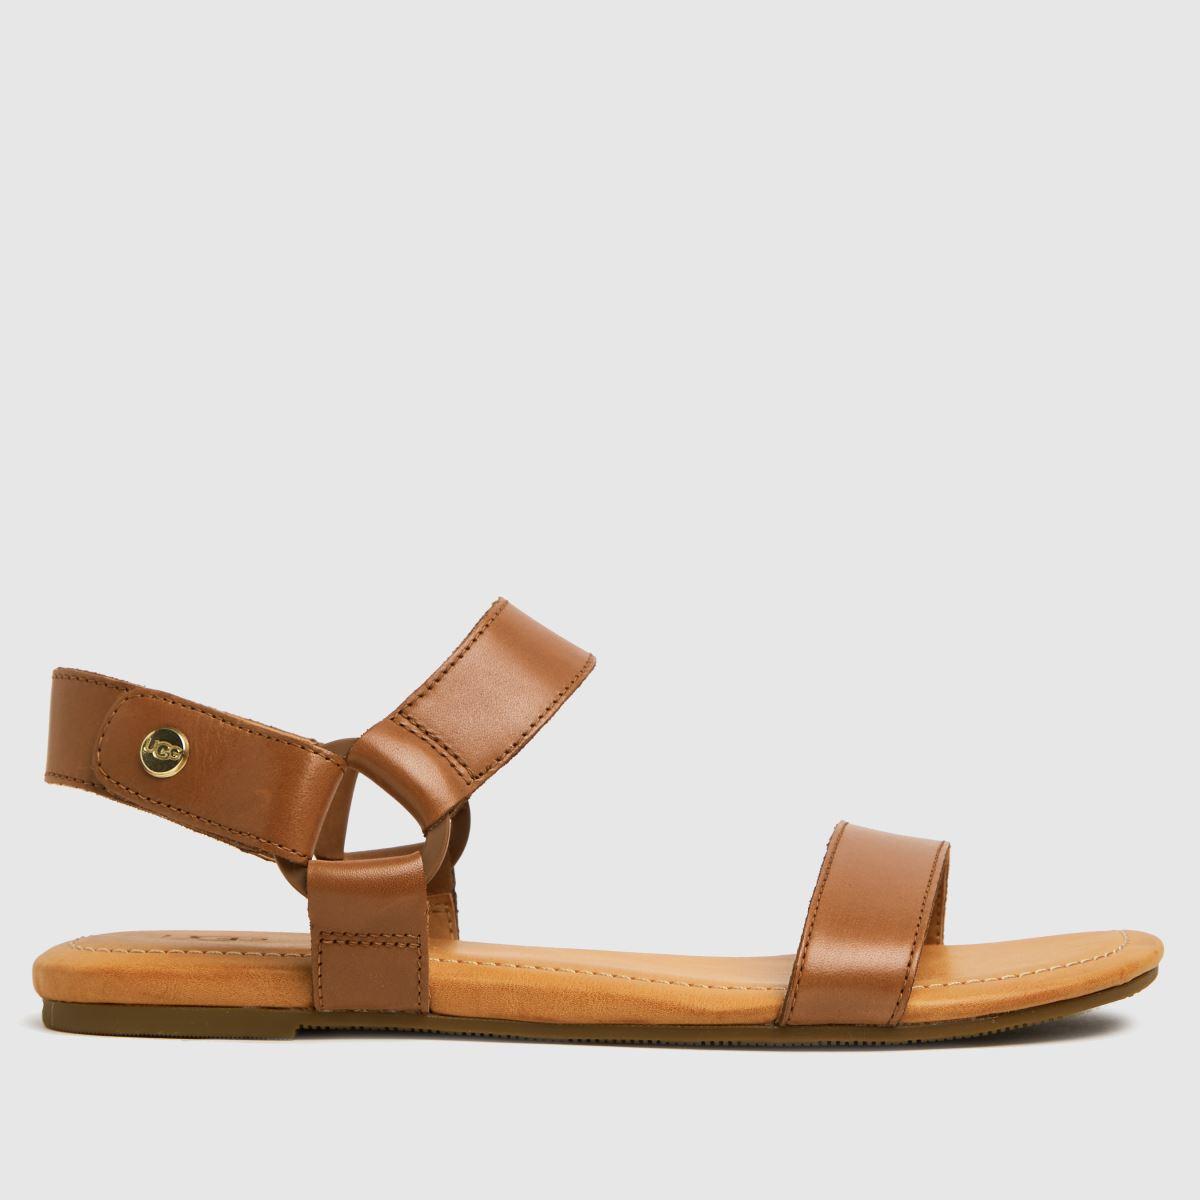 UGG Tan Rynell Sandals